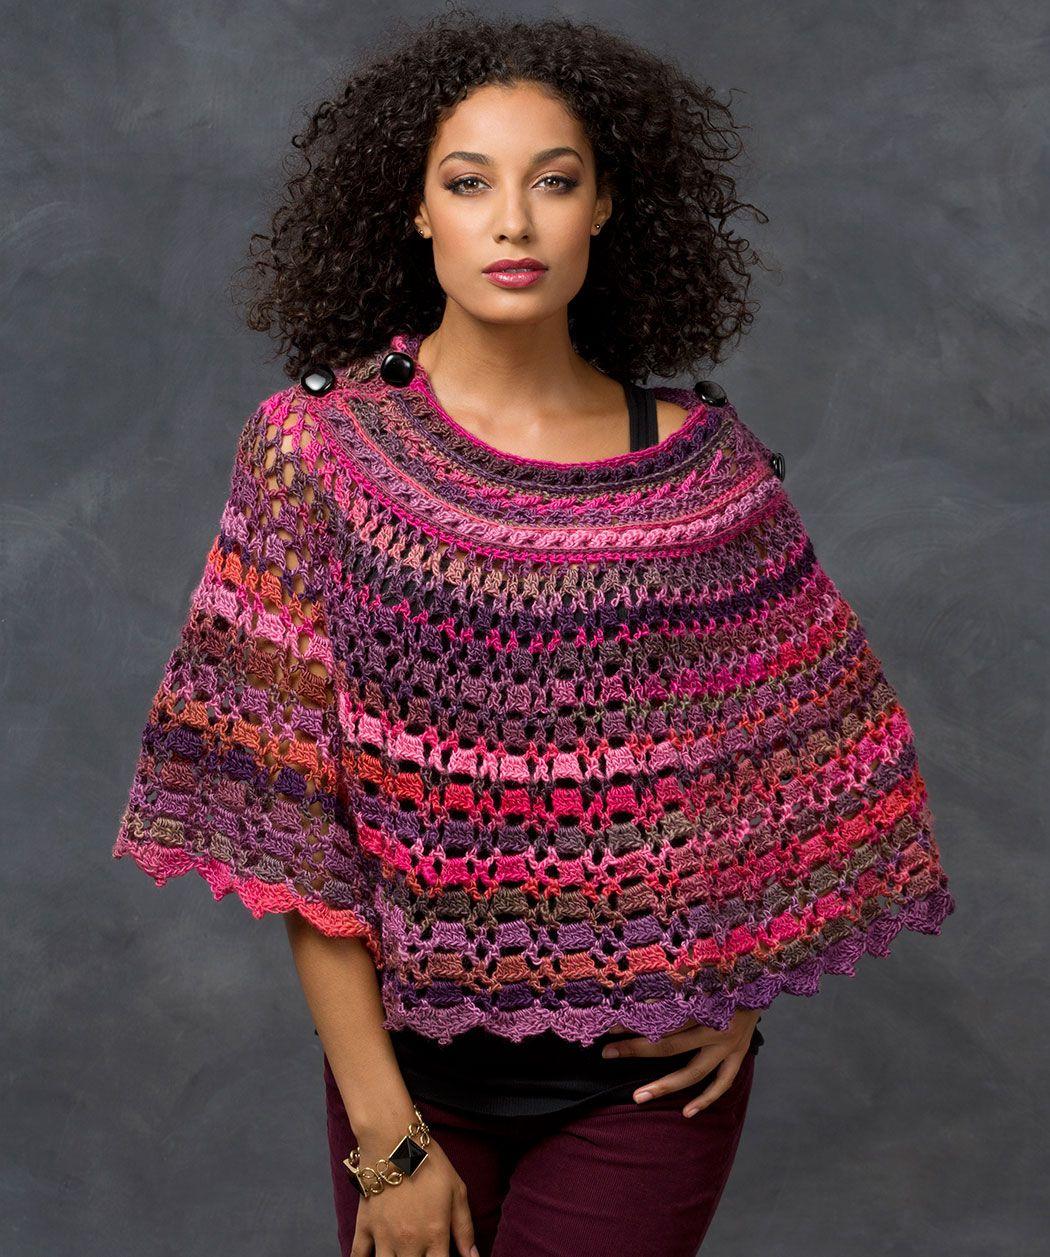 Dubonnet Poncho Crochet Pattern #crochet #redheartyarns | New, New ...